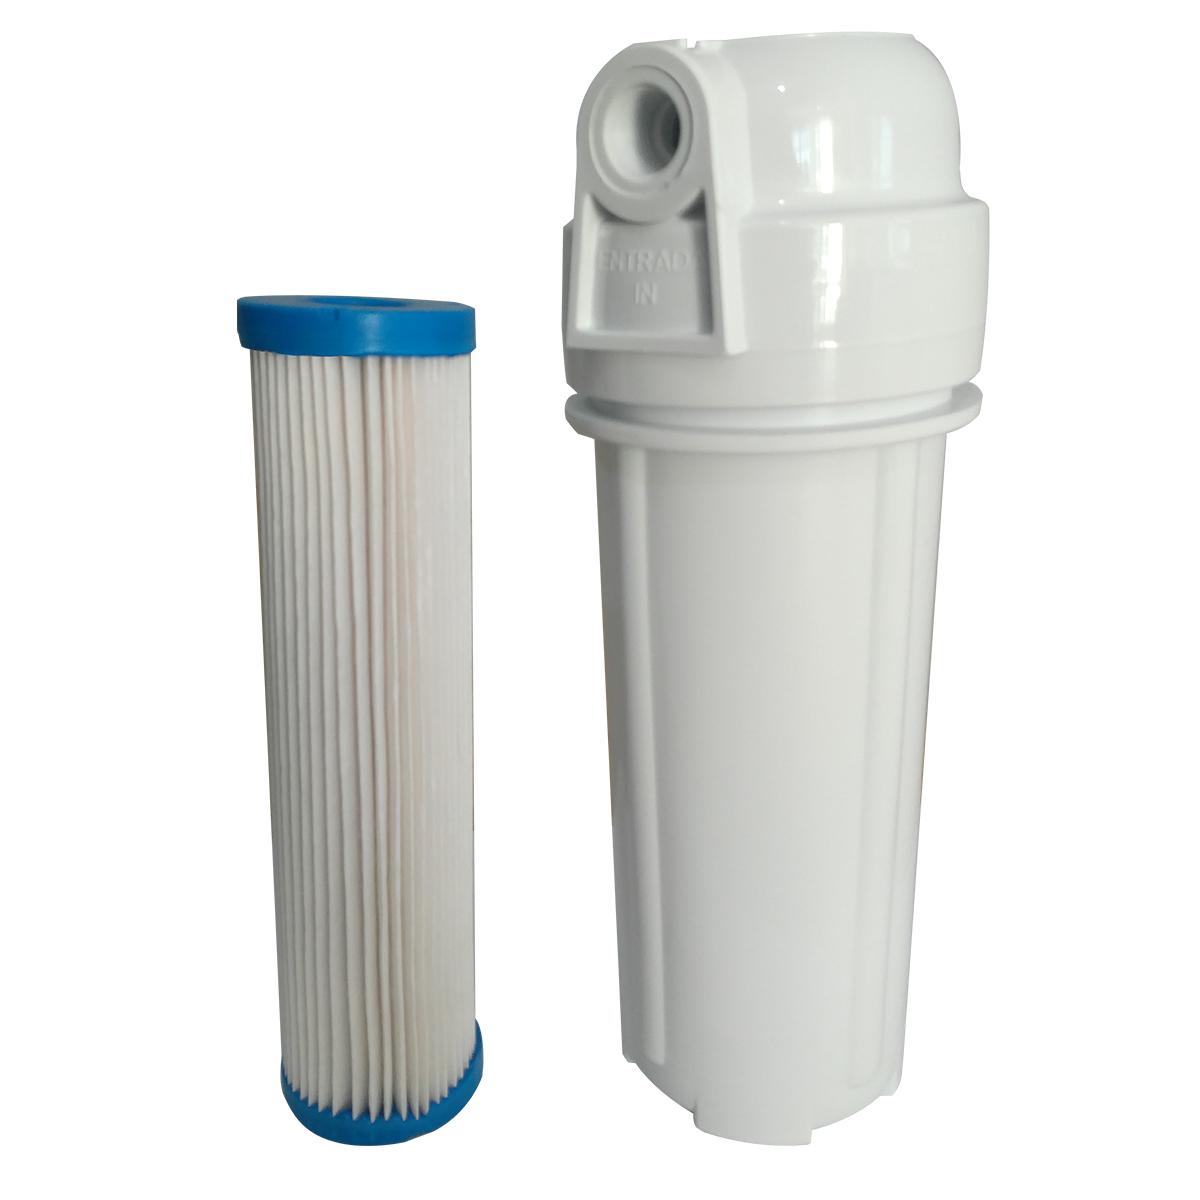 Filtro para Caixa D'Água e Cavalete Plissado Rosca 1/2